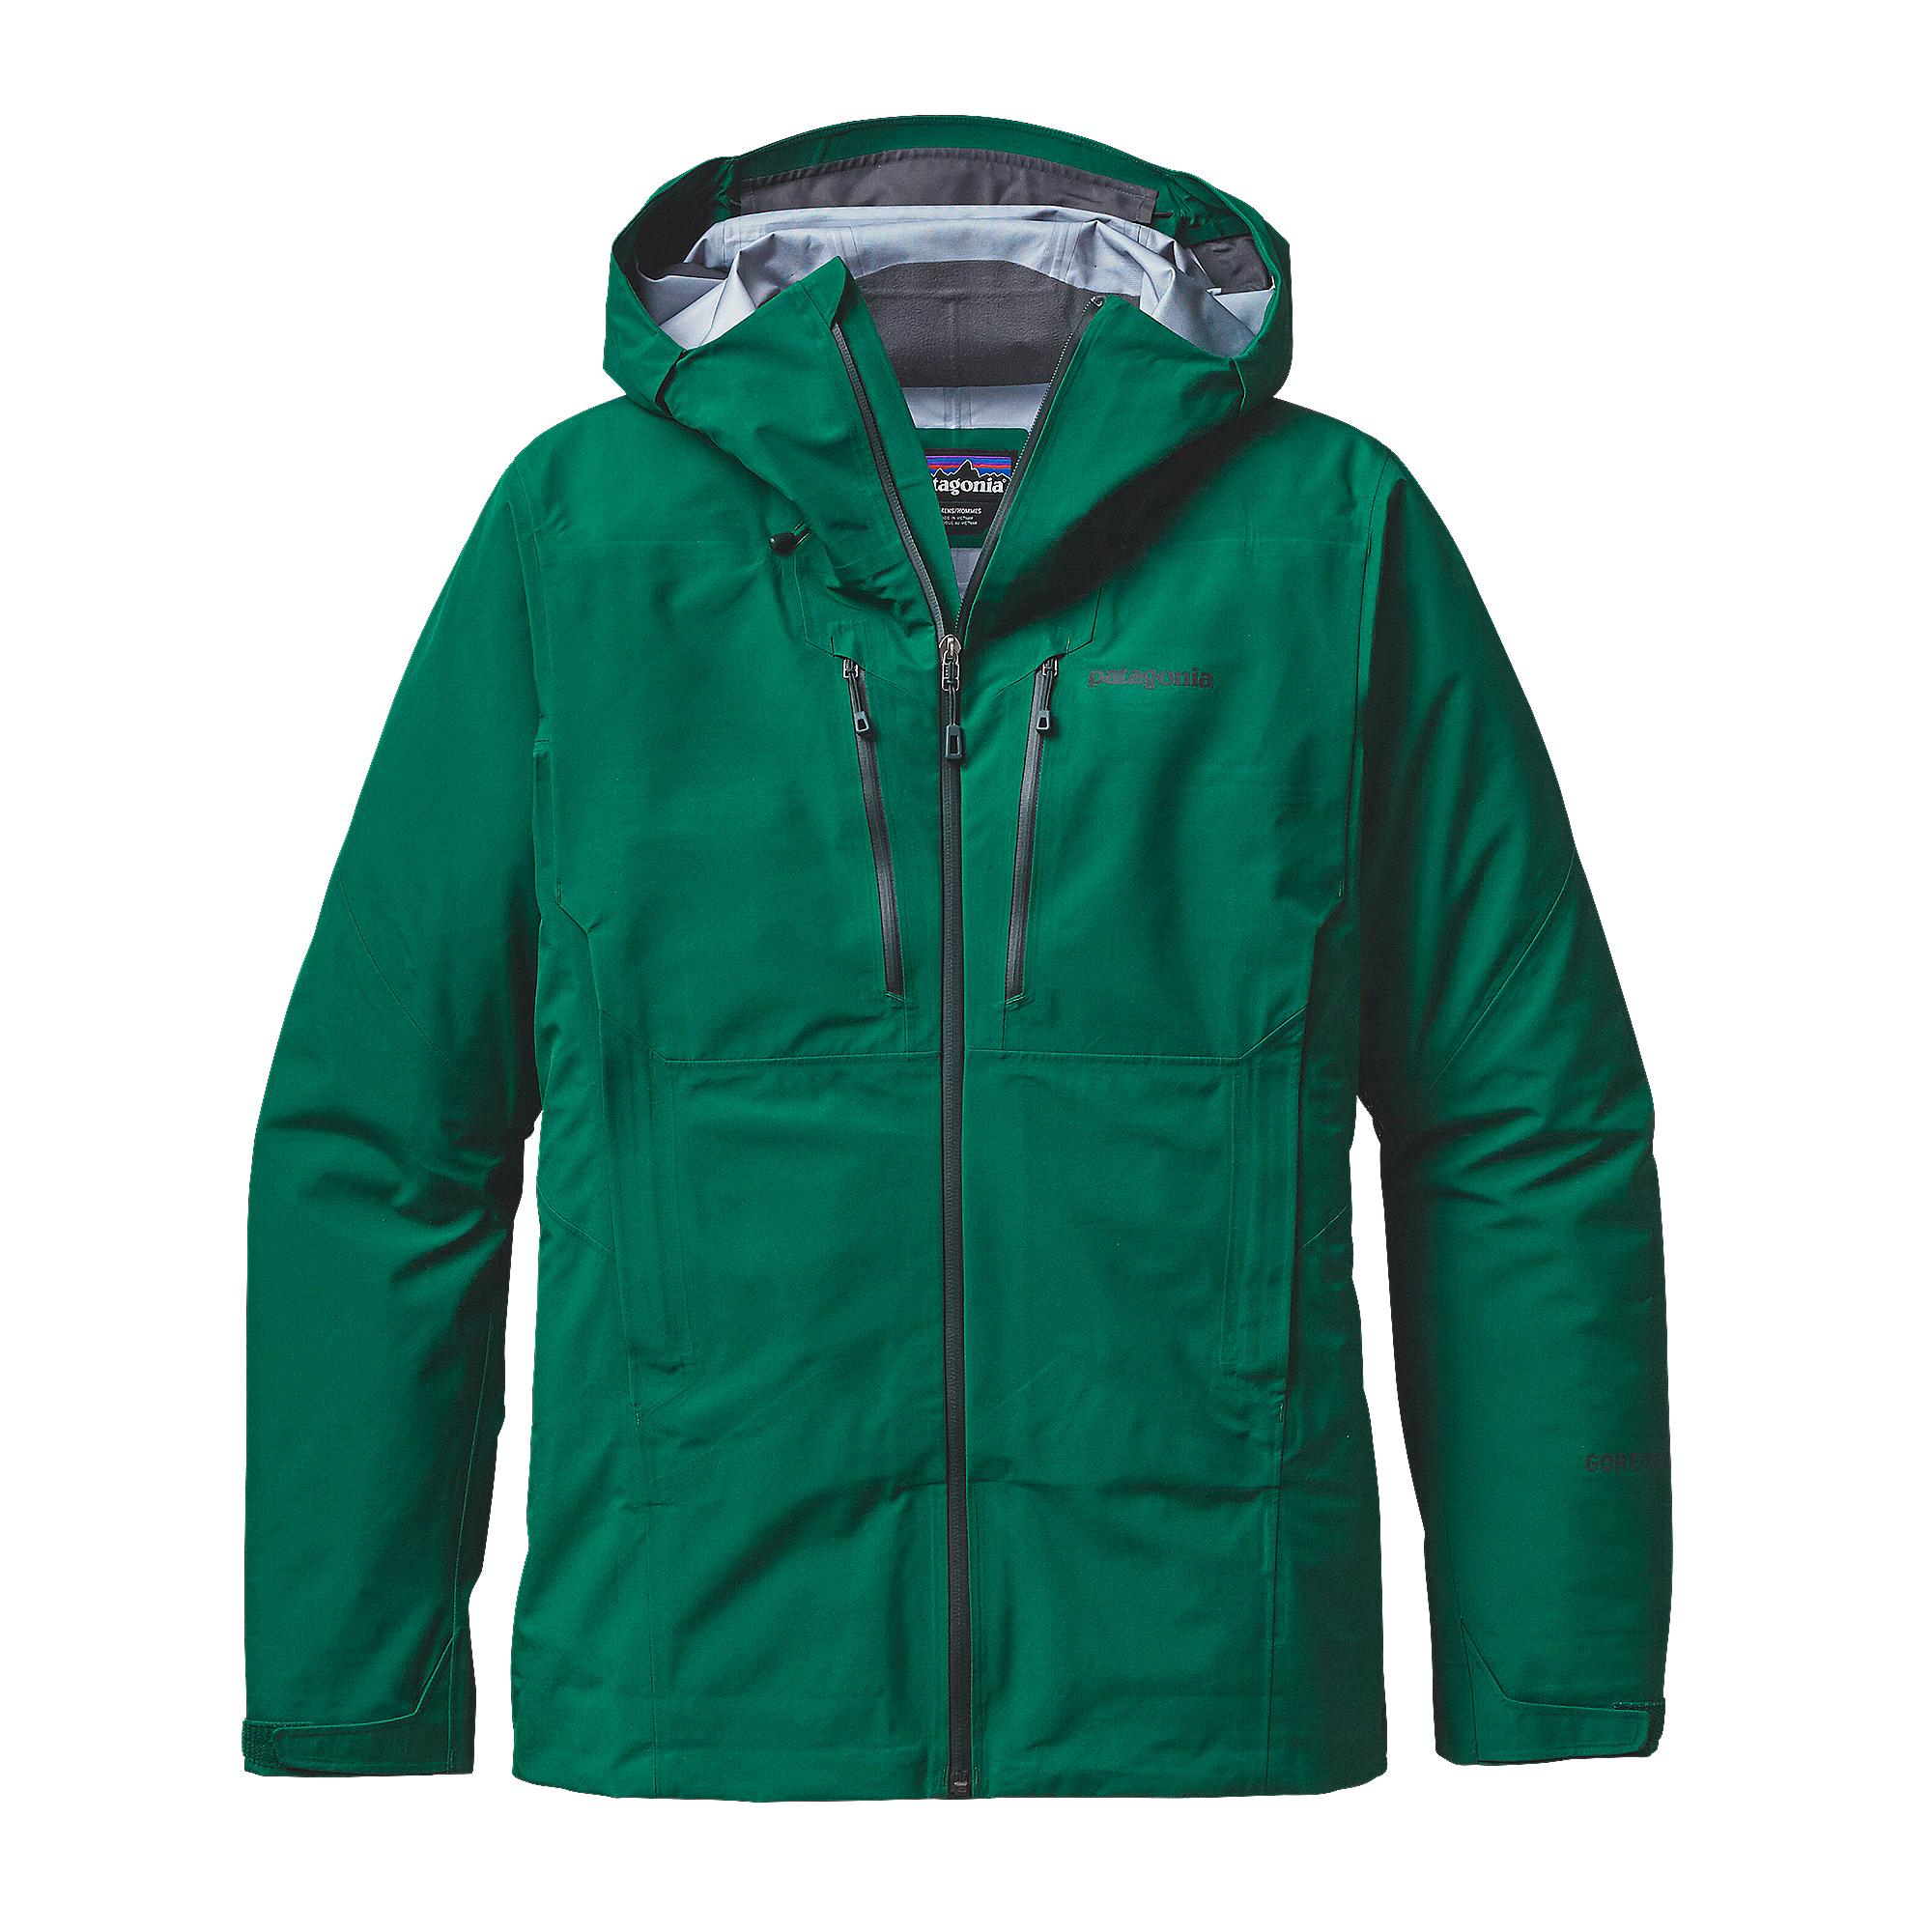 quality design f737a 5d3ba Patagonia Giacca Goretex Men's Triolet Jacket